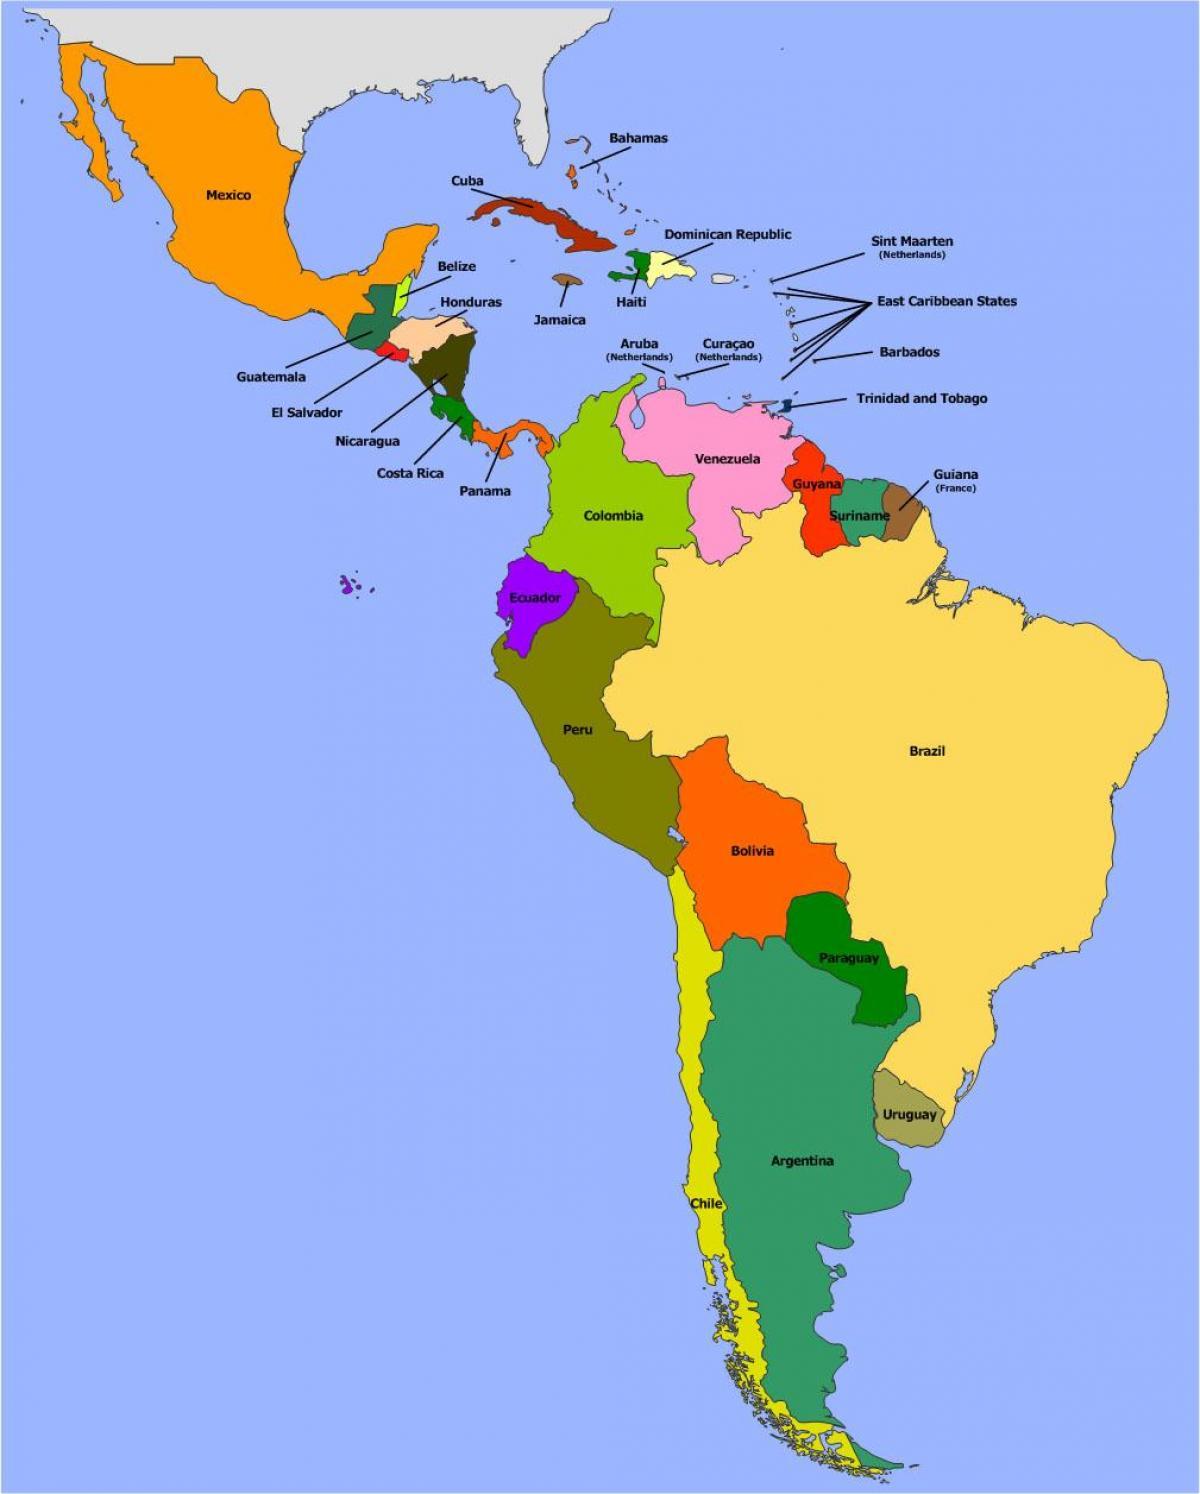 Belize Juzna Amerika Mapa Mapa Belize Juznej Amerike Stredna